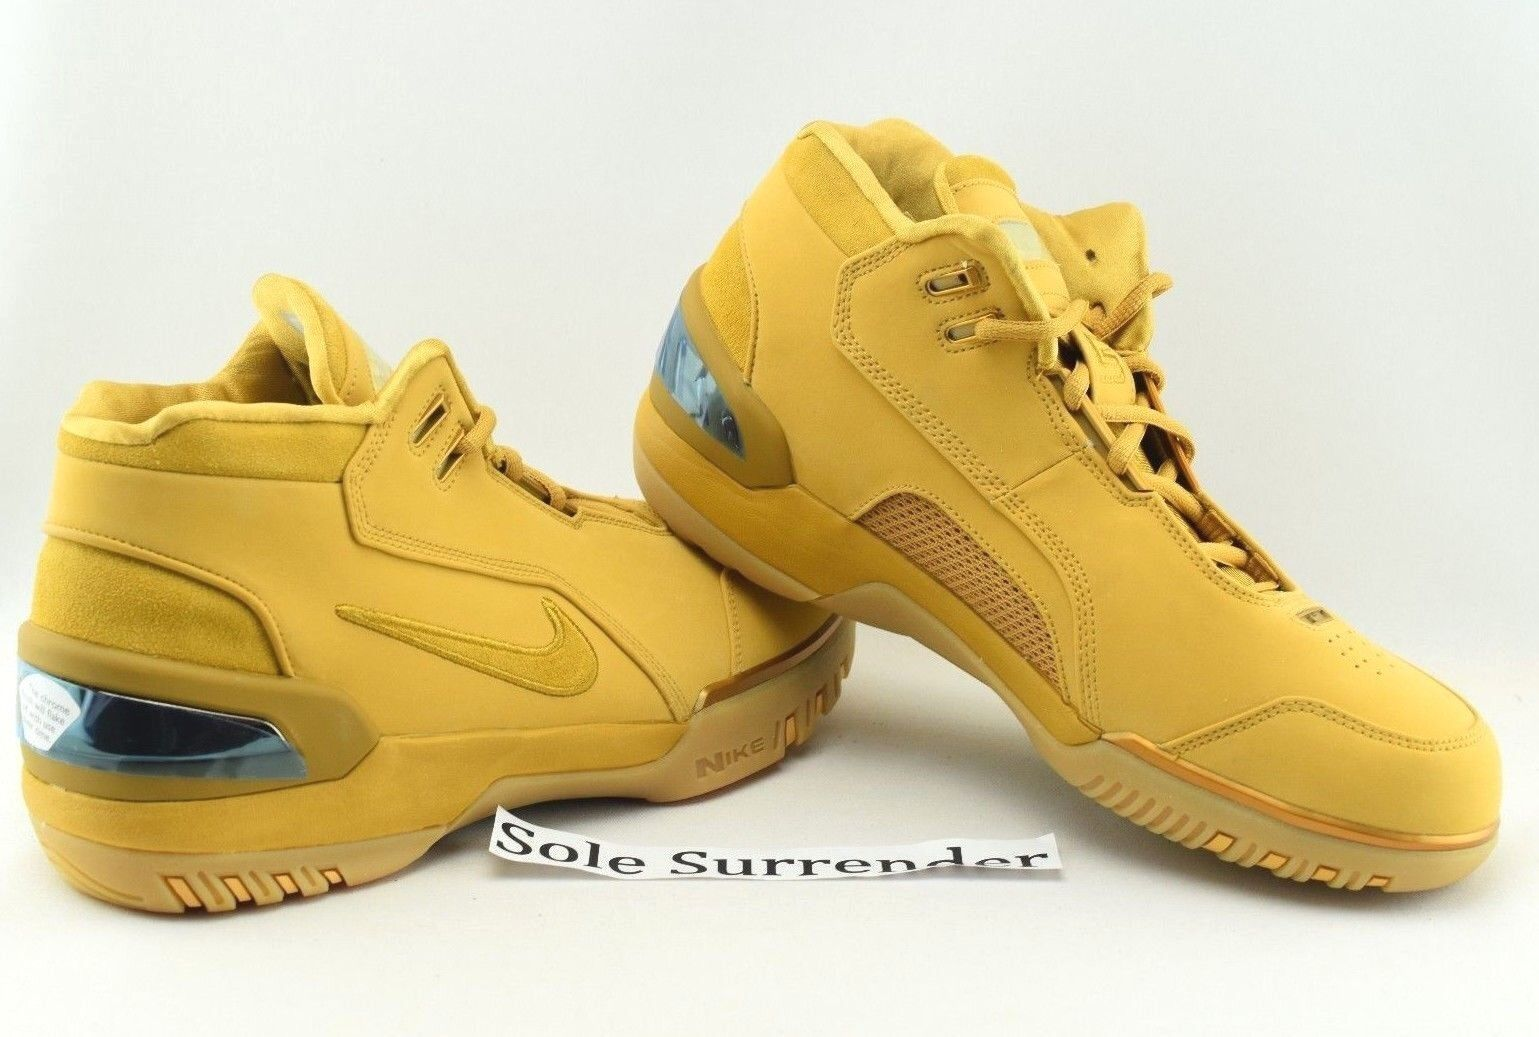 Nike Air Zoom Generation ASG QS -CHOOSE SIZE- AQ0110-700 Wheat Gold AZG All Star